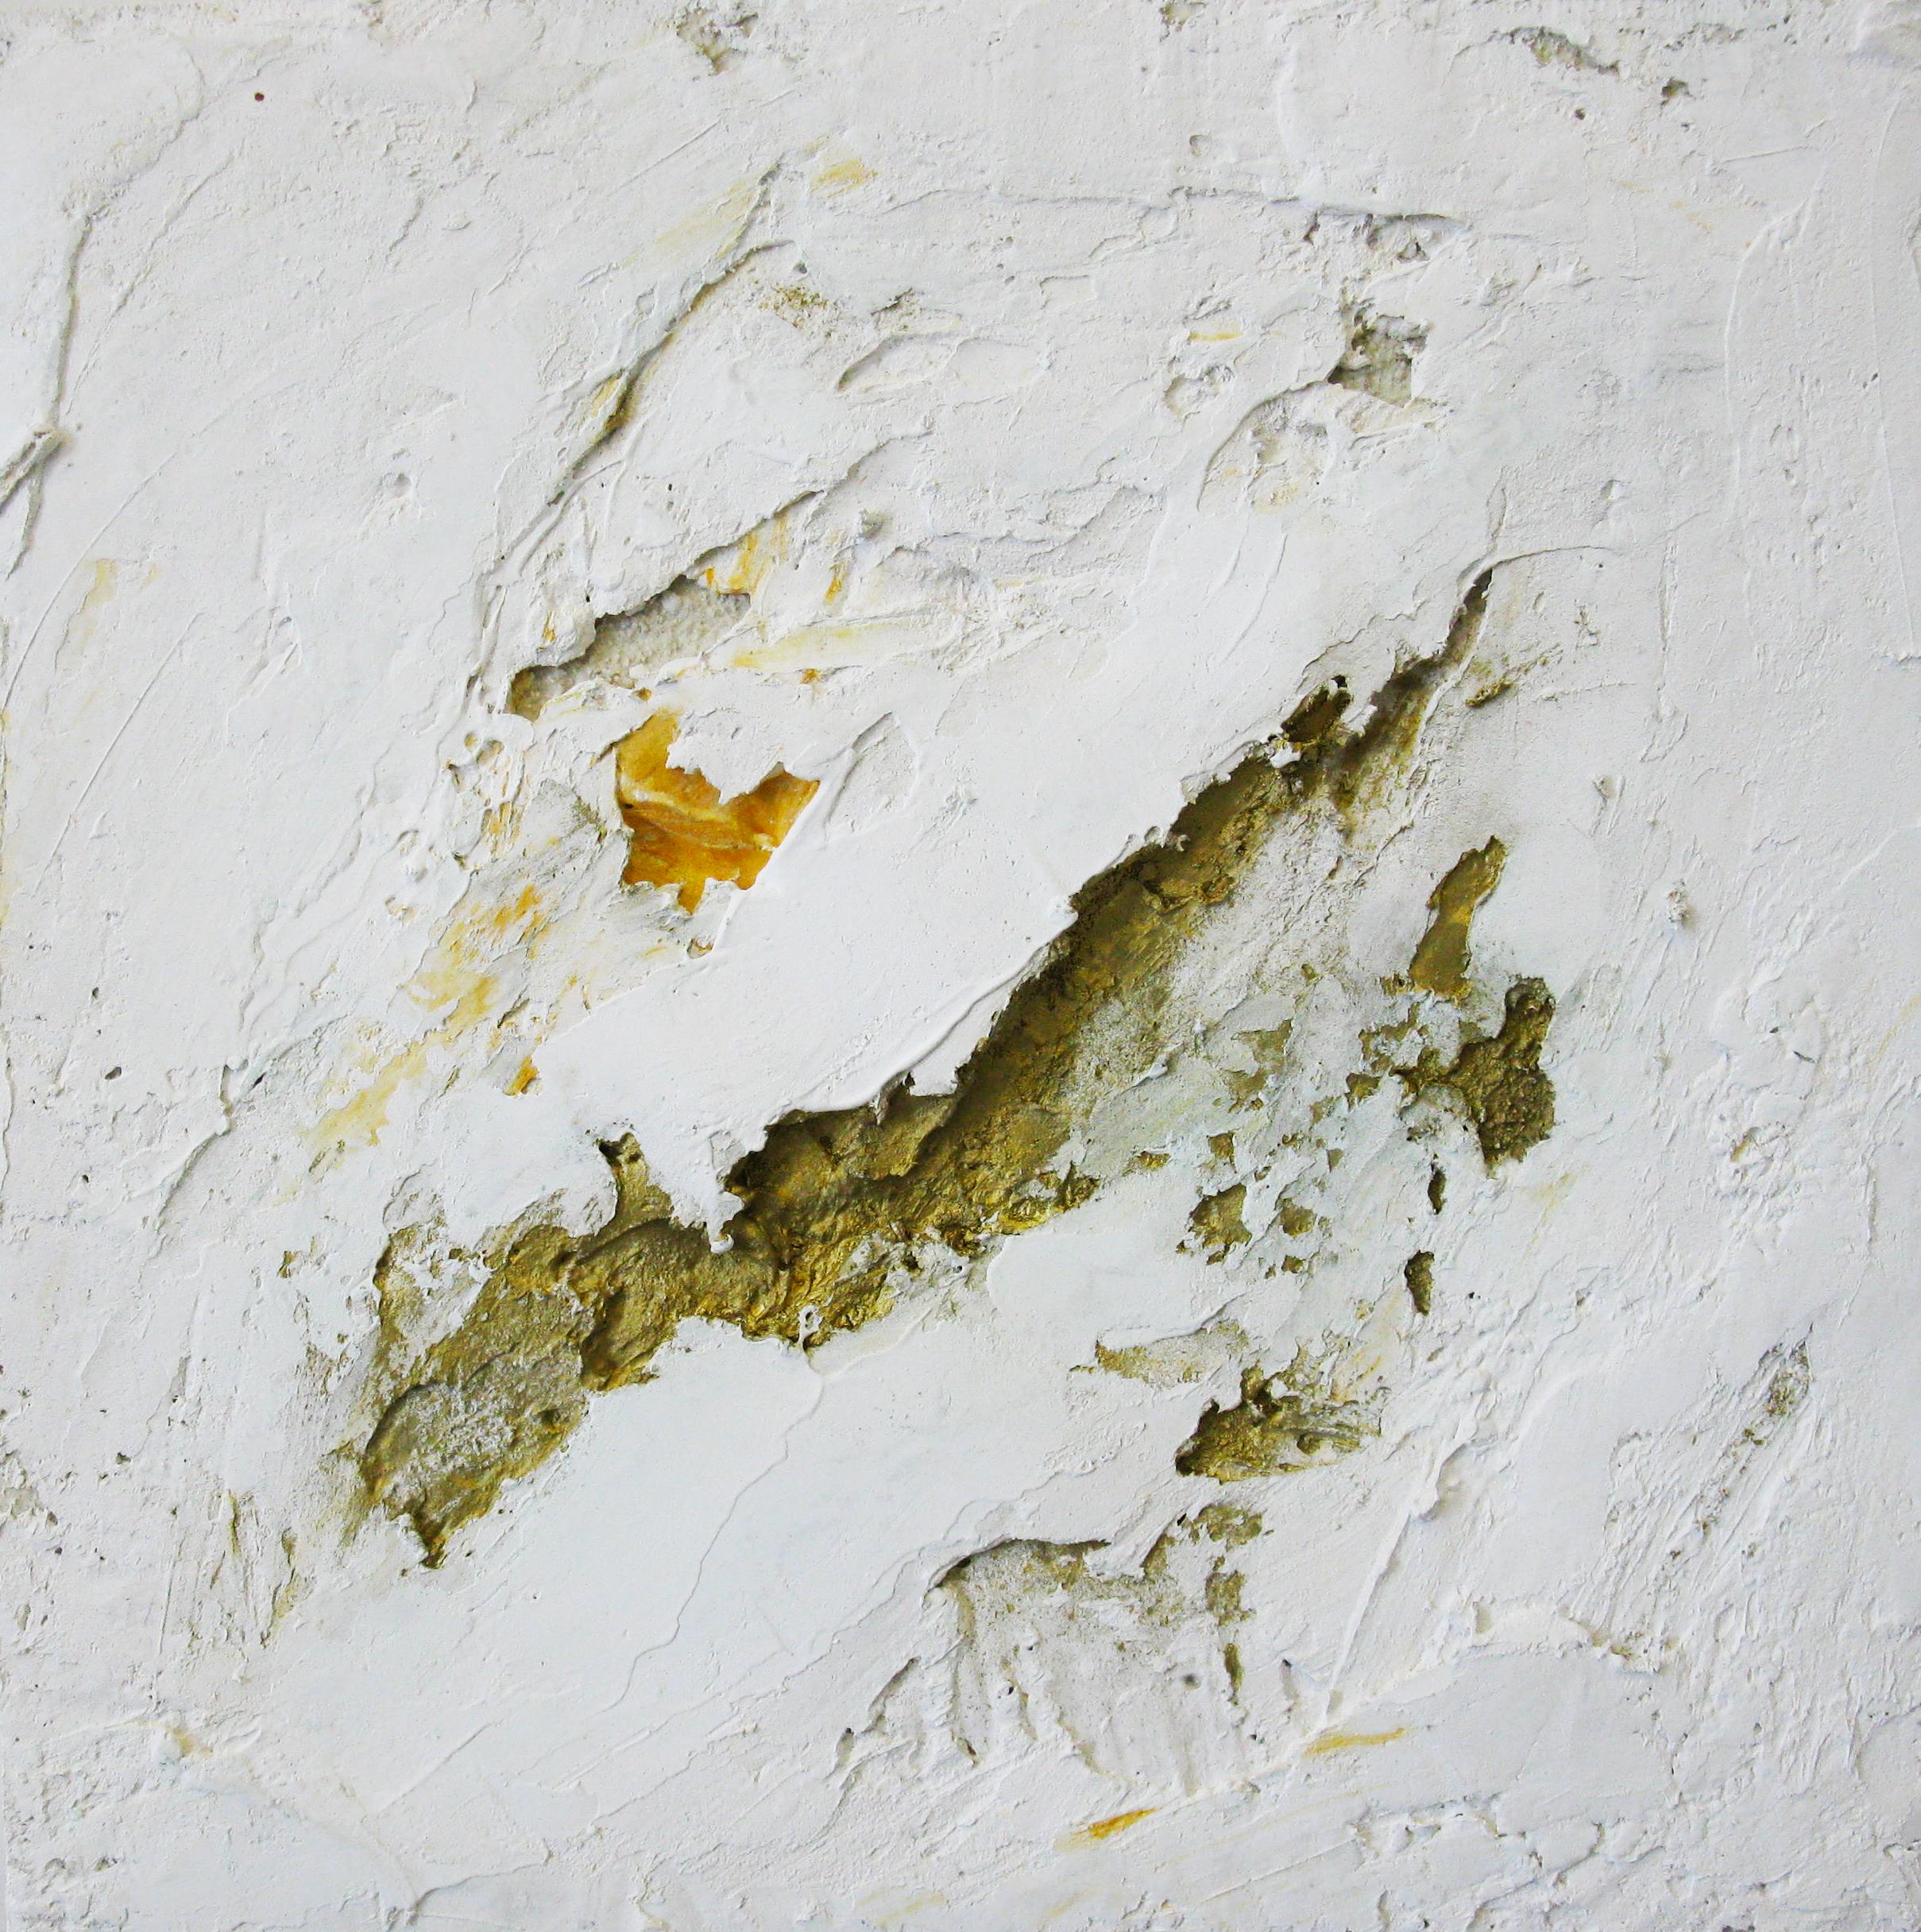 Mario Arlati, Luce, 2007, mixed media on canvas, cm 40x40